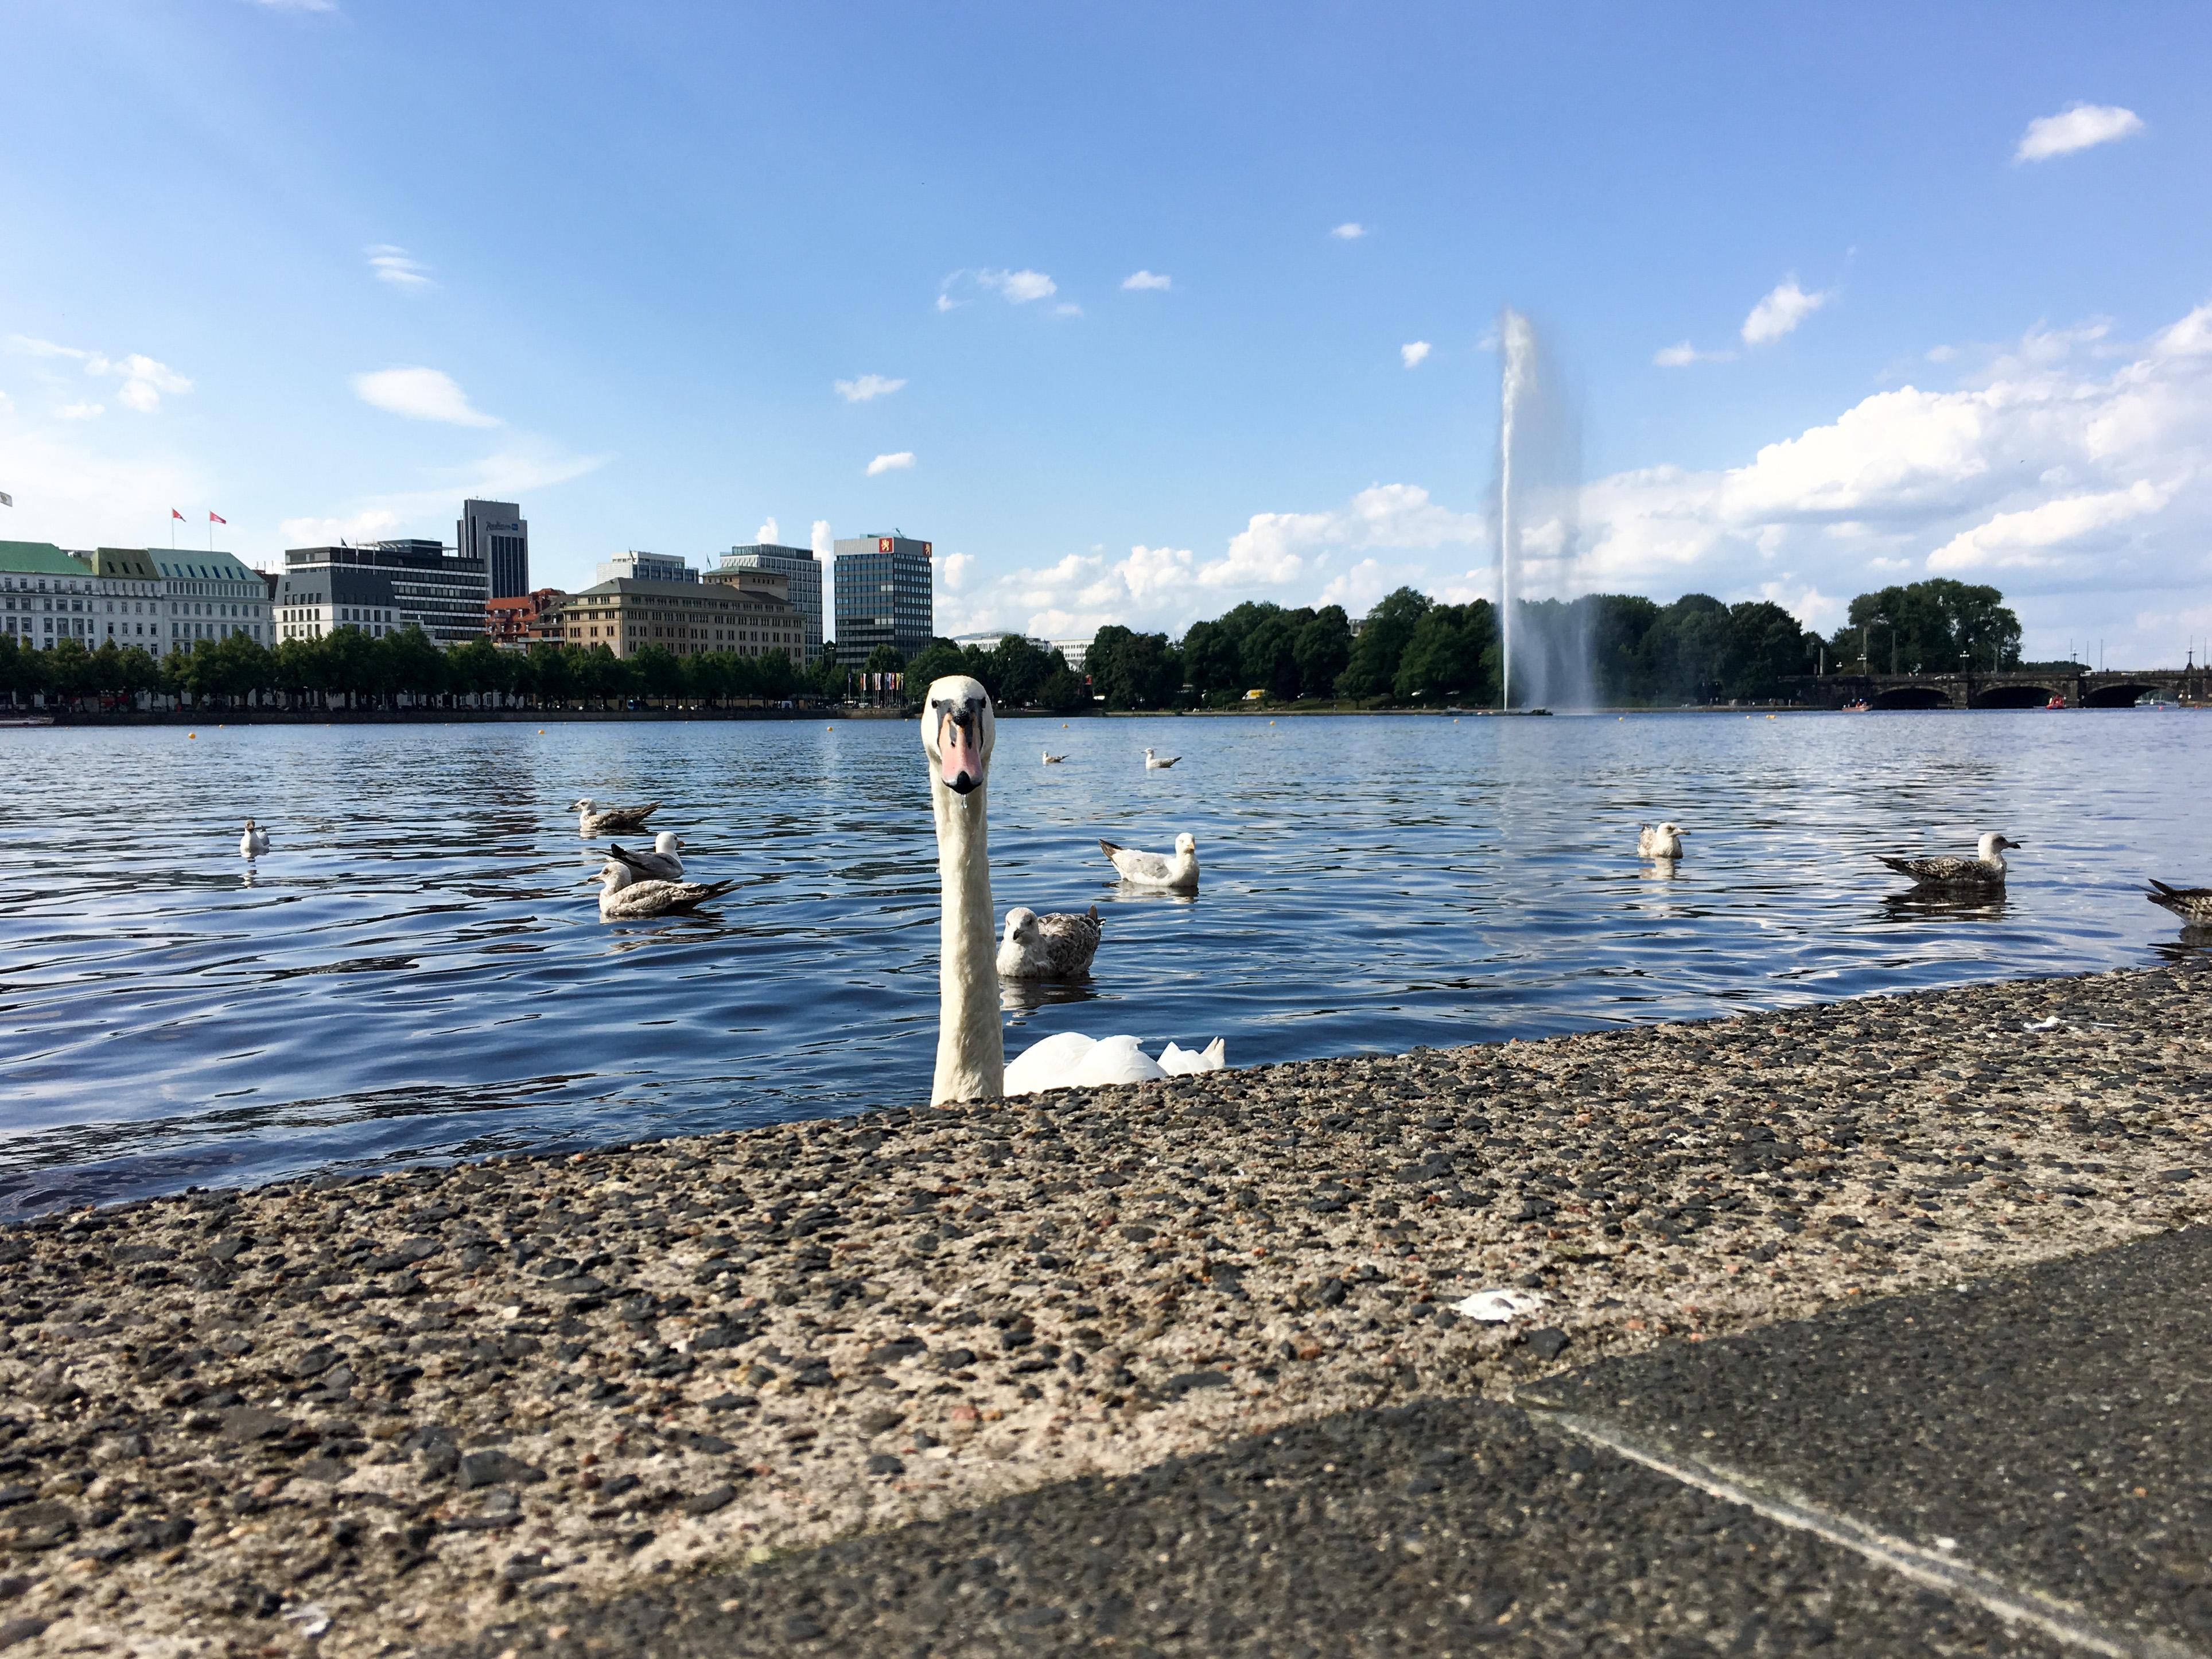 Schwan Binnenalster Hamburg Juli 2017